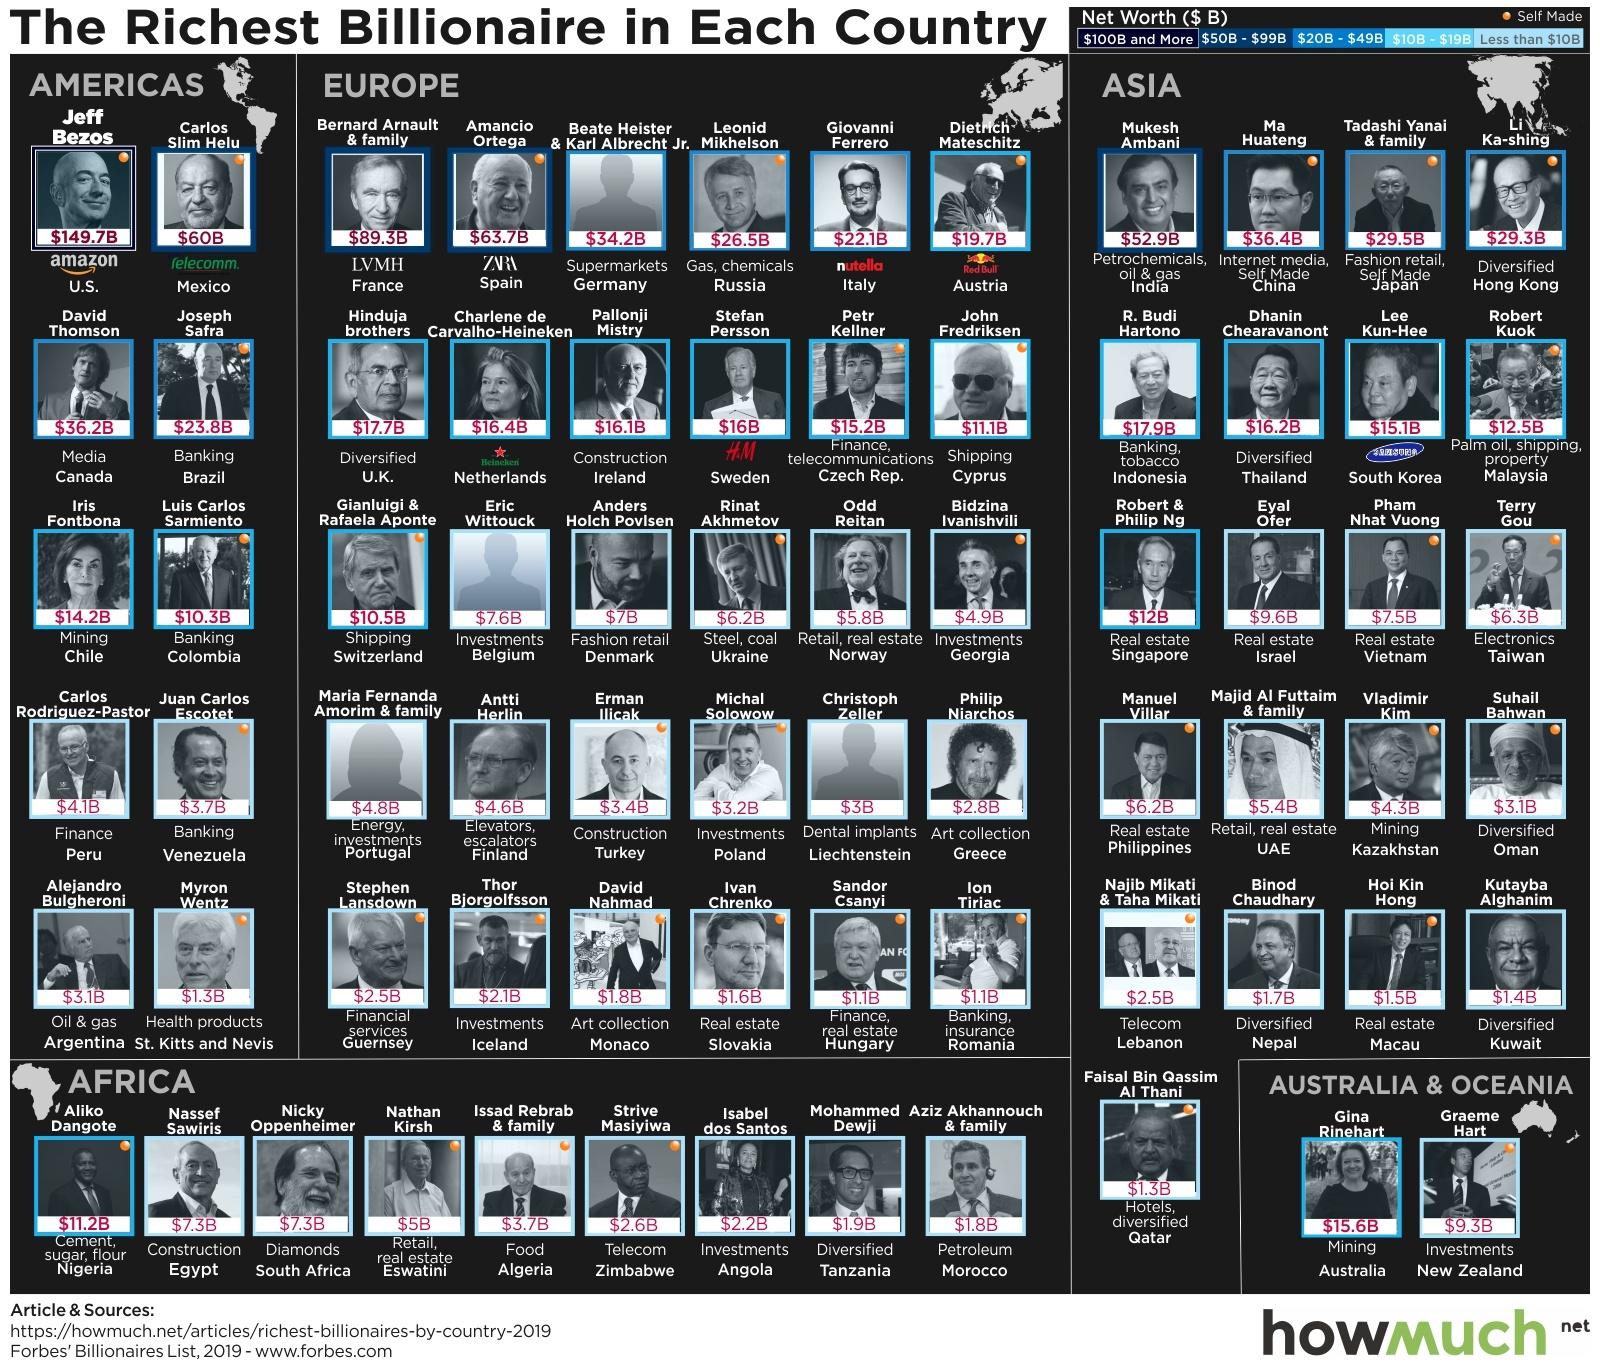 Wealthiest Billionaires